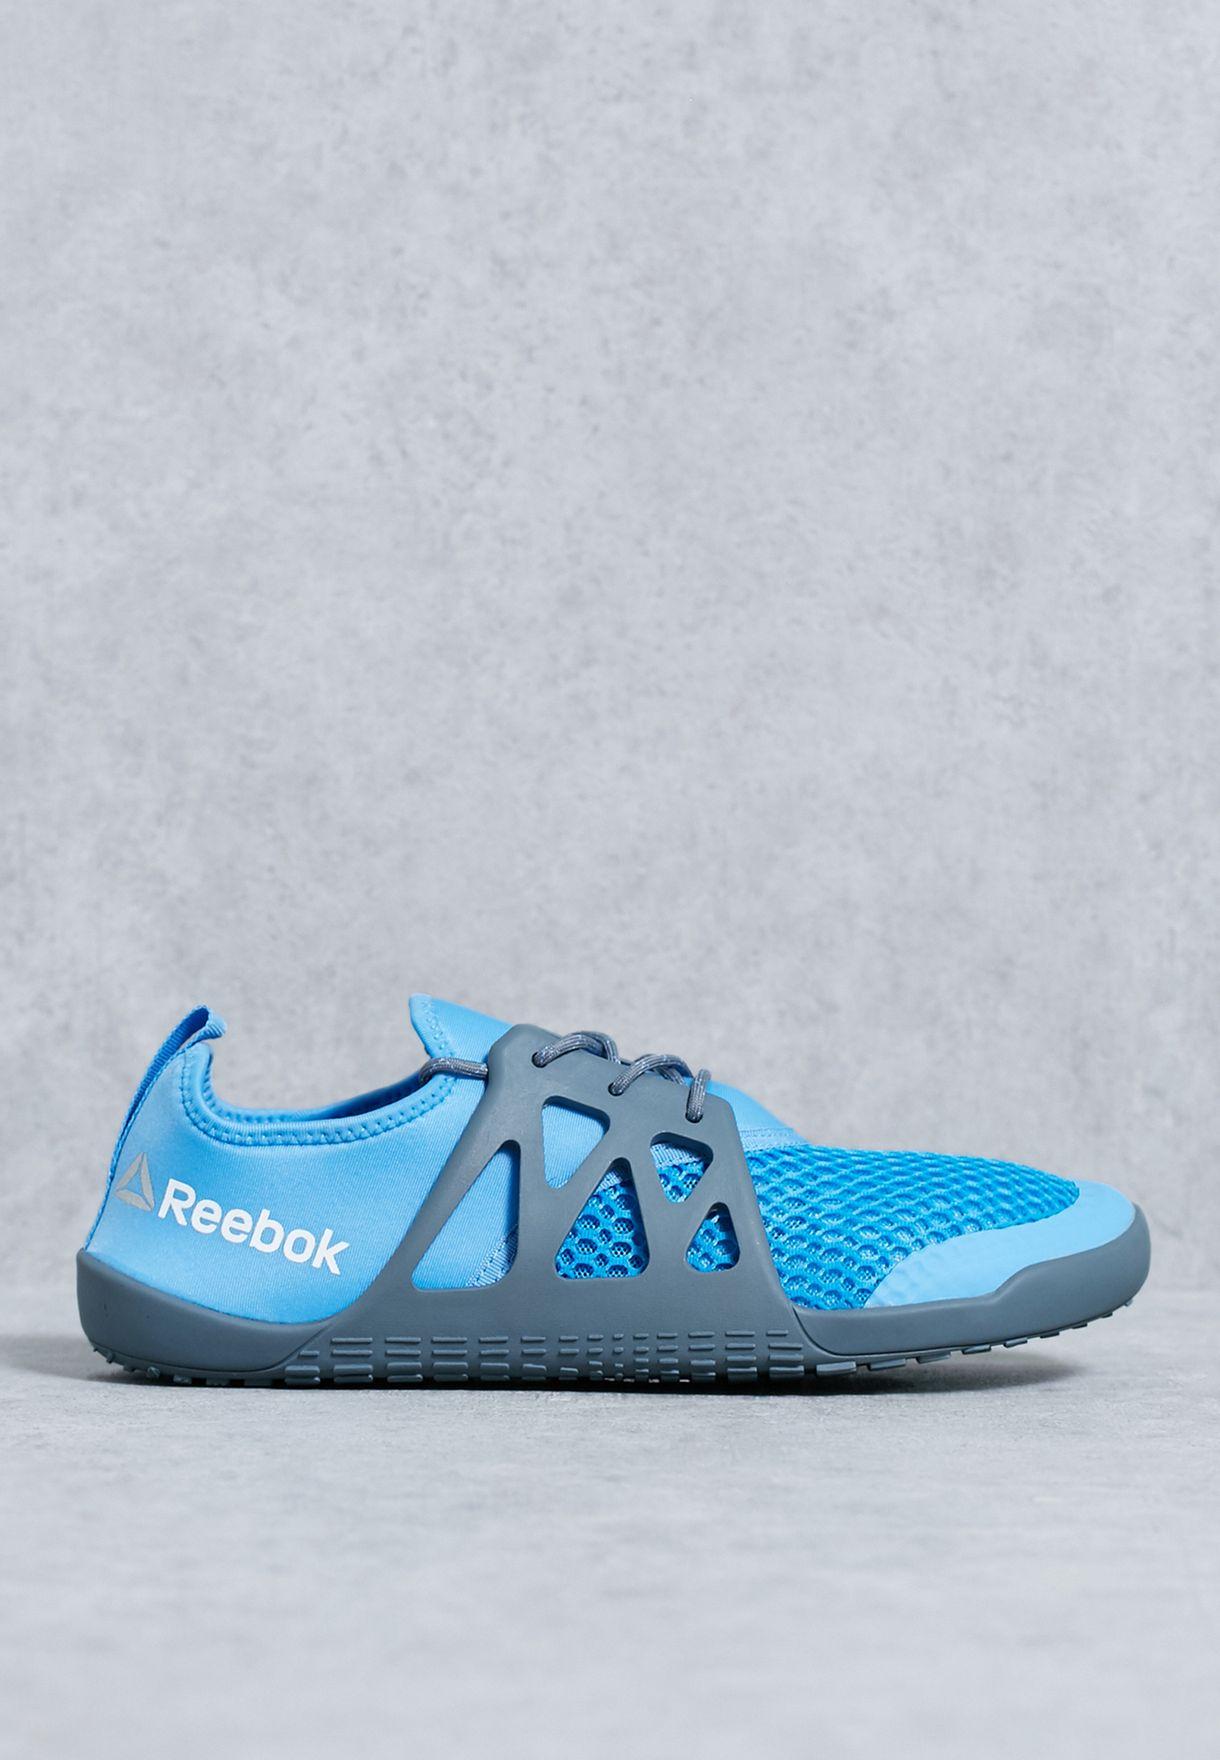 Buy Reebok blue Aqua Grip TR for Men in